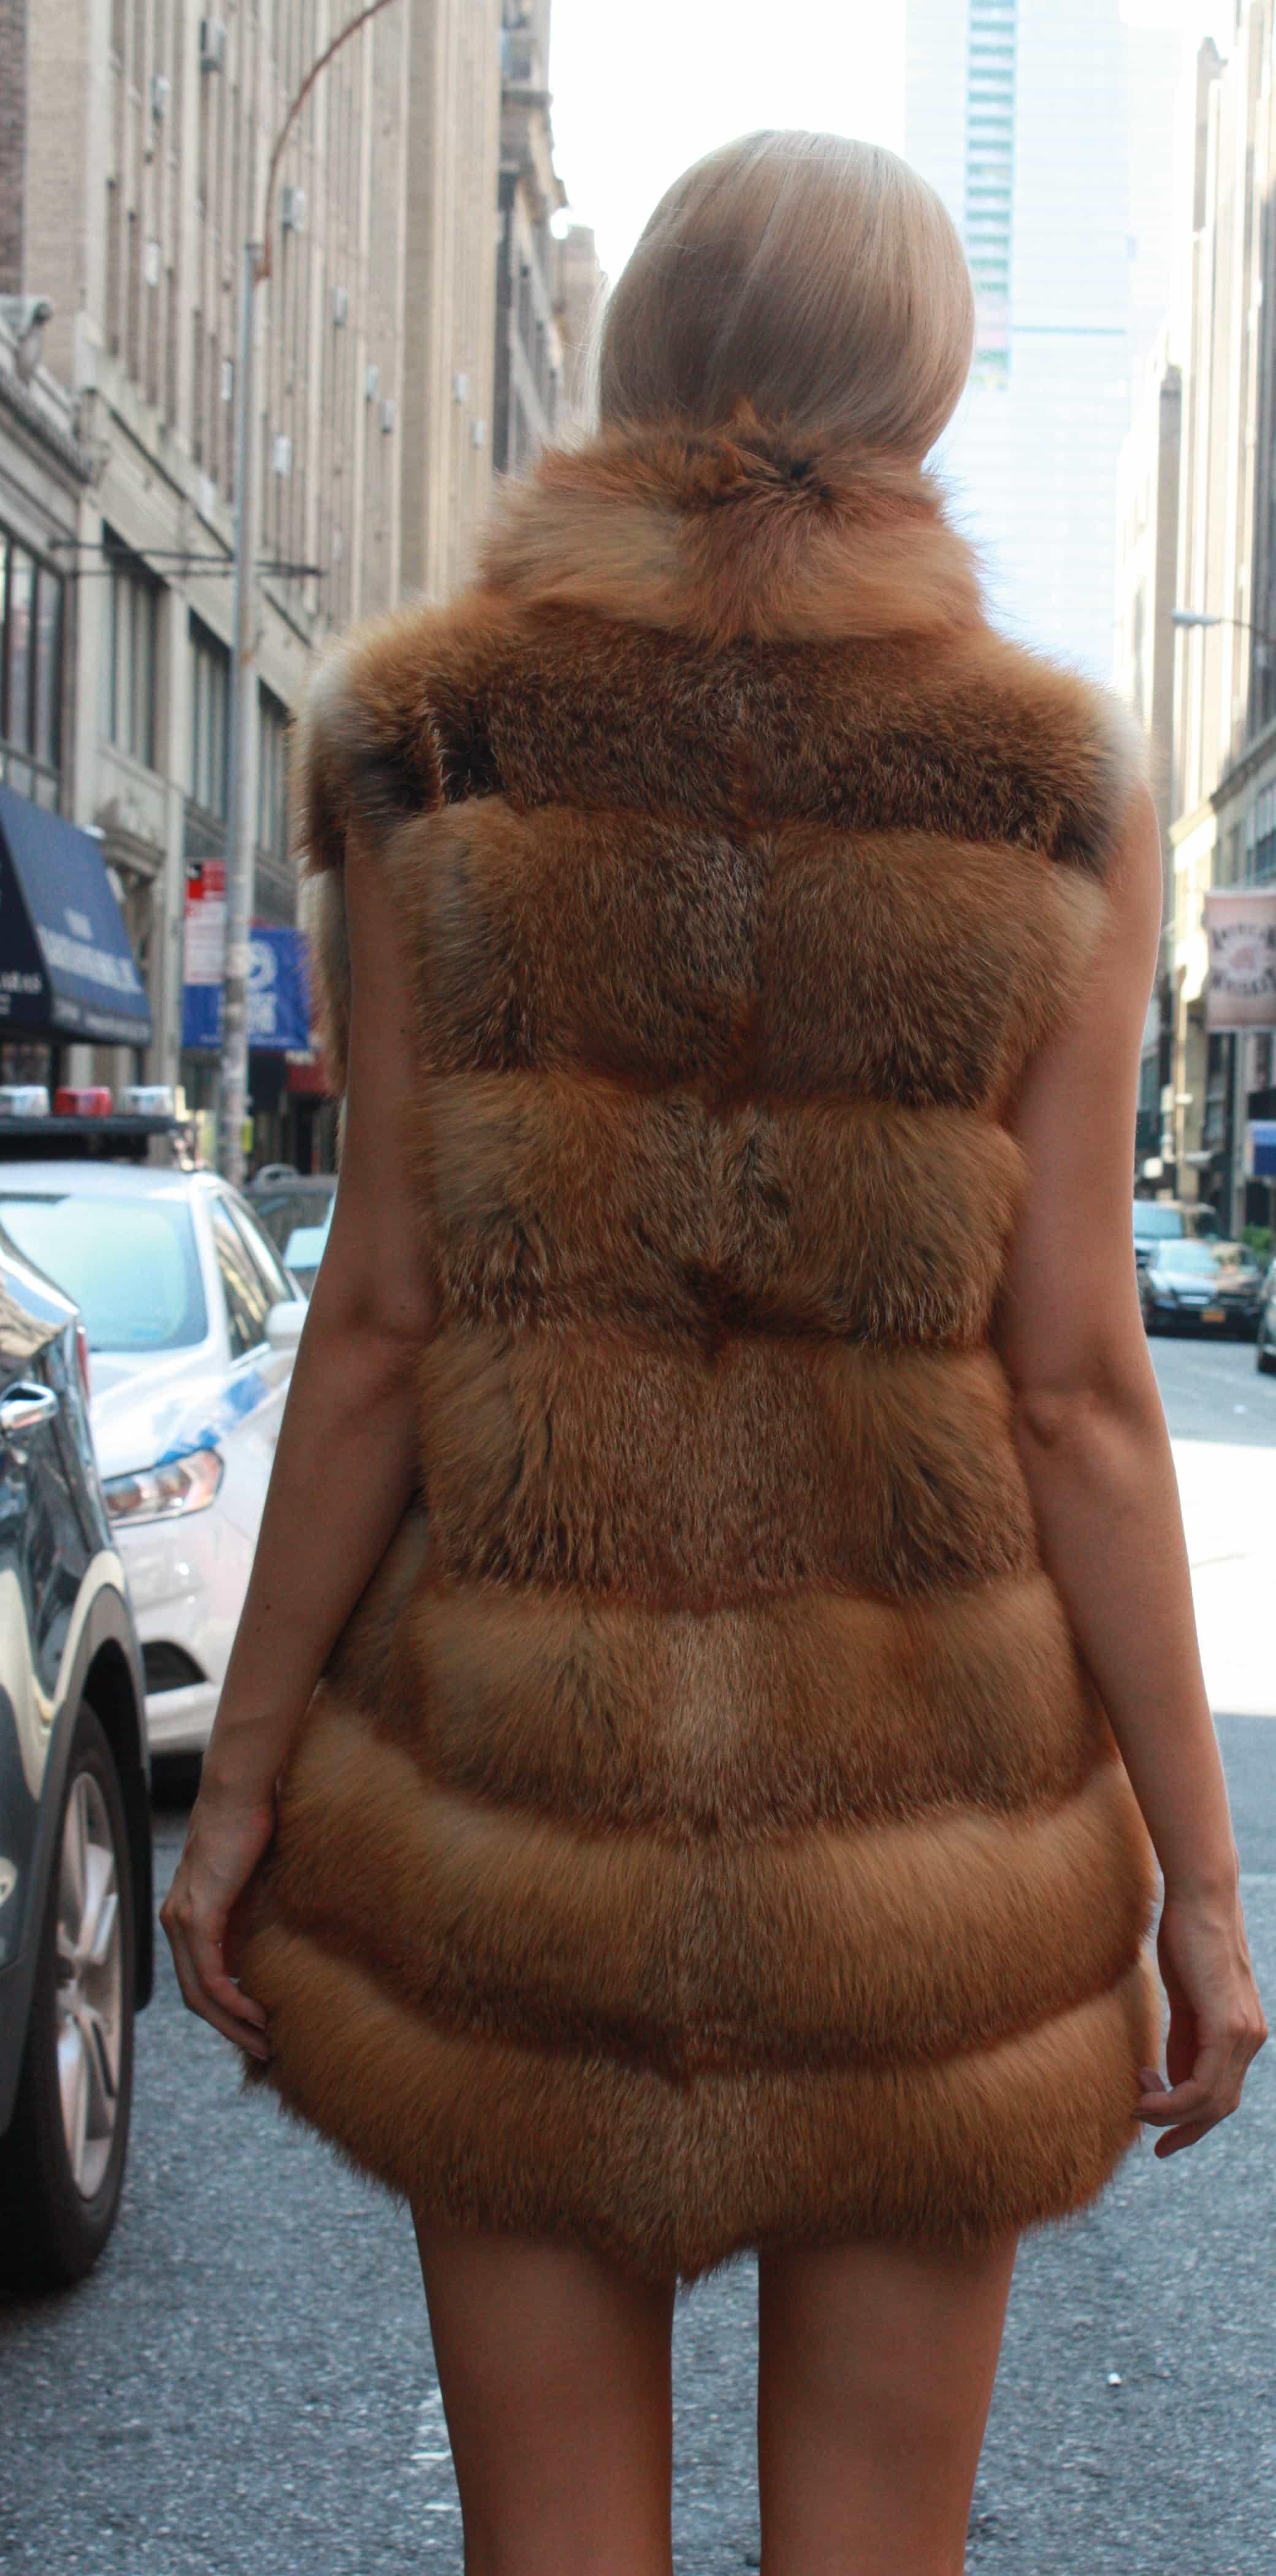 Marc Kaufman Furs Presents a red fox fur horizontal vest from Marc Kaufman Furs New York,Argentina,United Kingdom,Austria,Denmark,Norway,Australia,Finland,Saudi Arabia,Oman,Kuwait,Jordan,Egypt